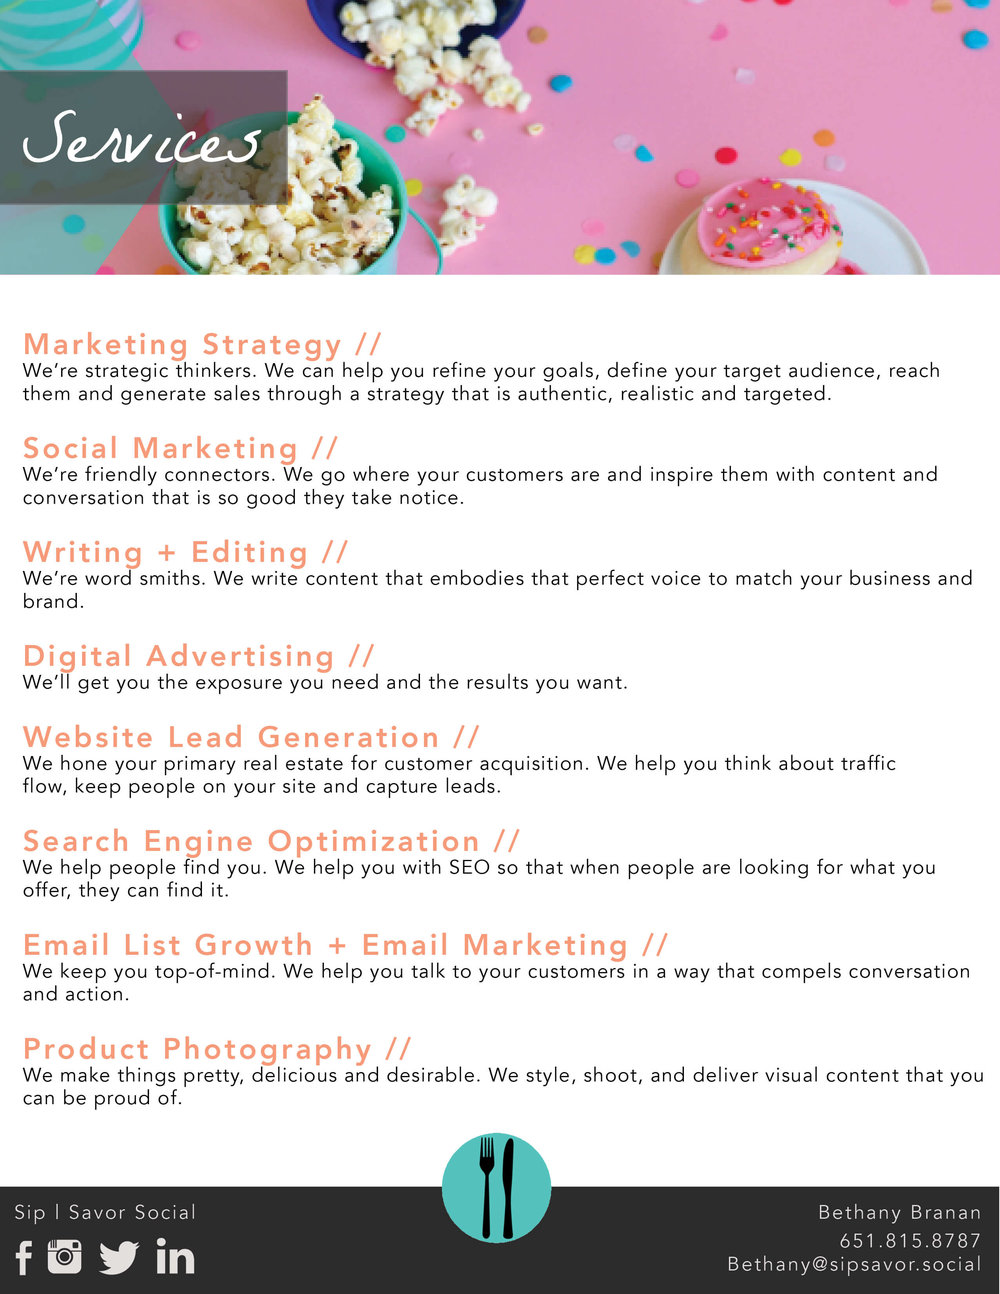 engle-olson-design-work-sip-savor-social3.jpg